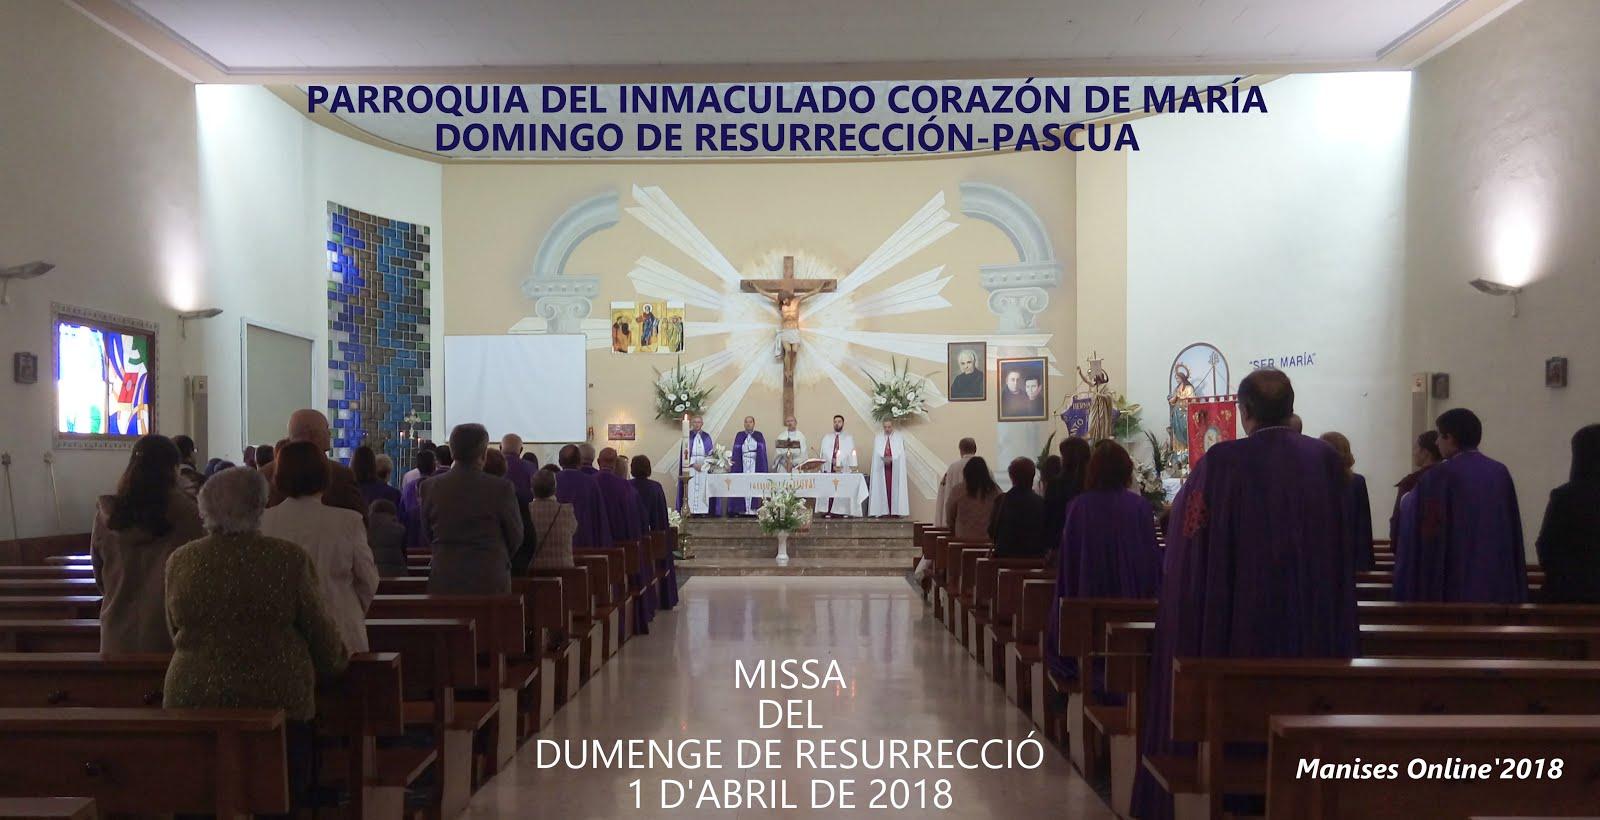 01.04.18 SEMANA SANTA MANISERA 2018: ENCUENTRO, L'ENCONTRE GLORIÓS